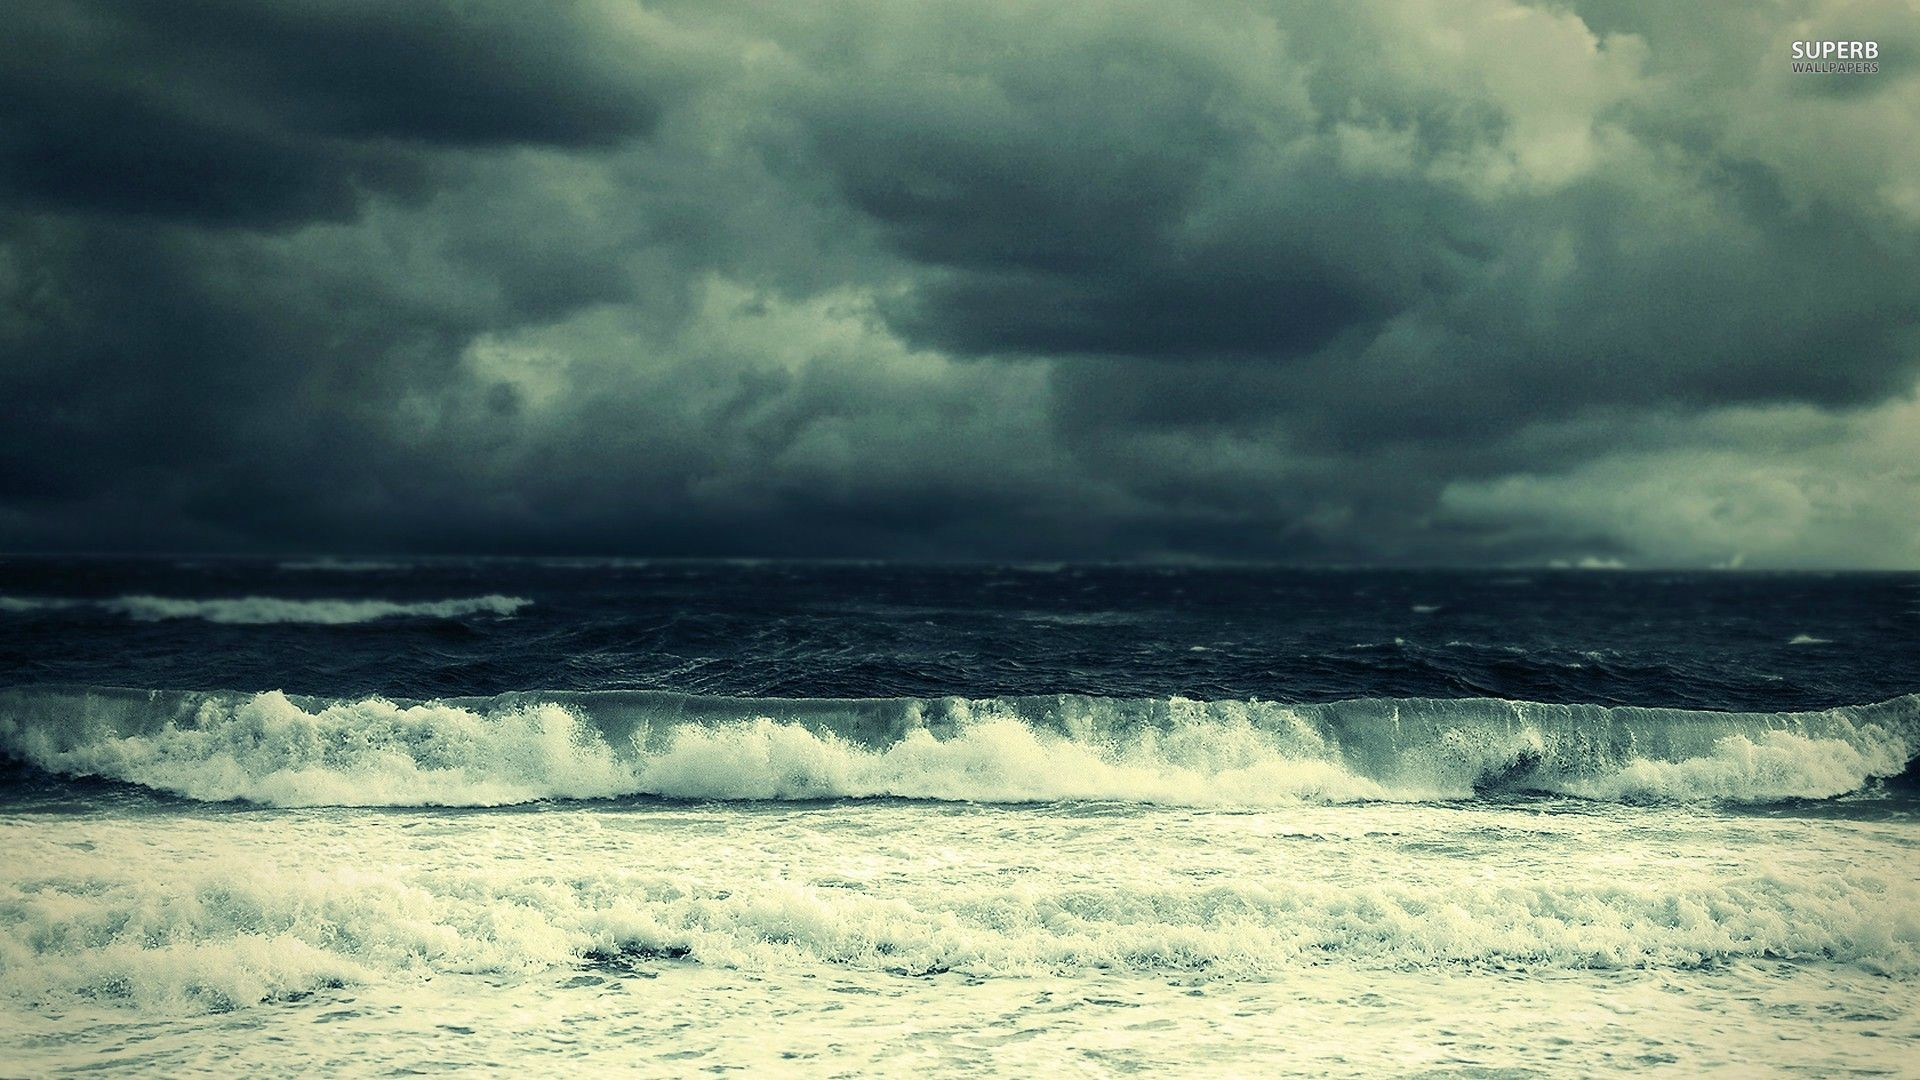 Stormy sea wallpaper – Beach wallpapers – #26679